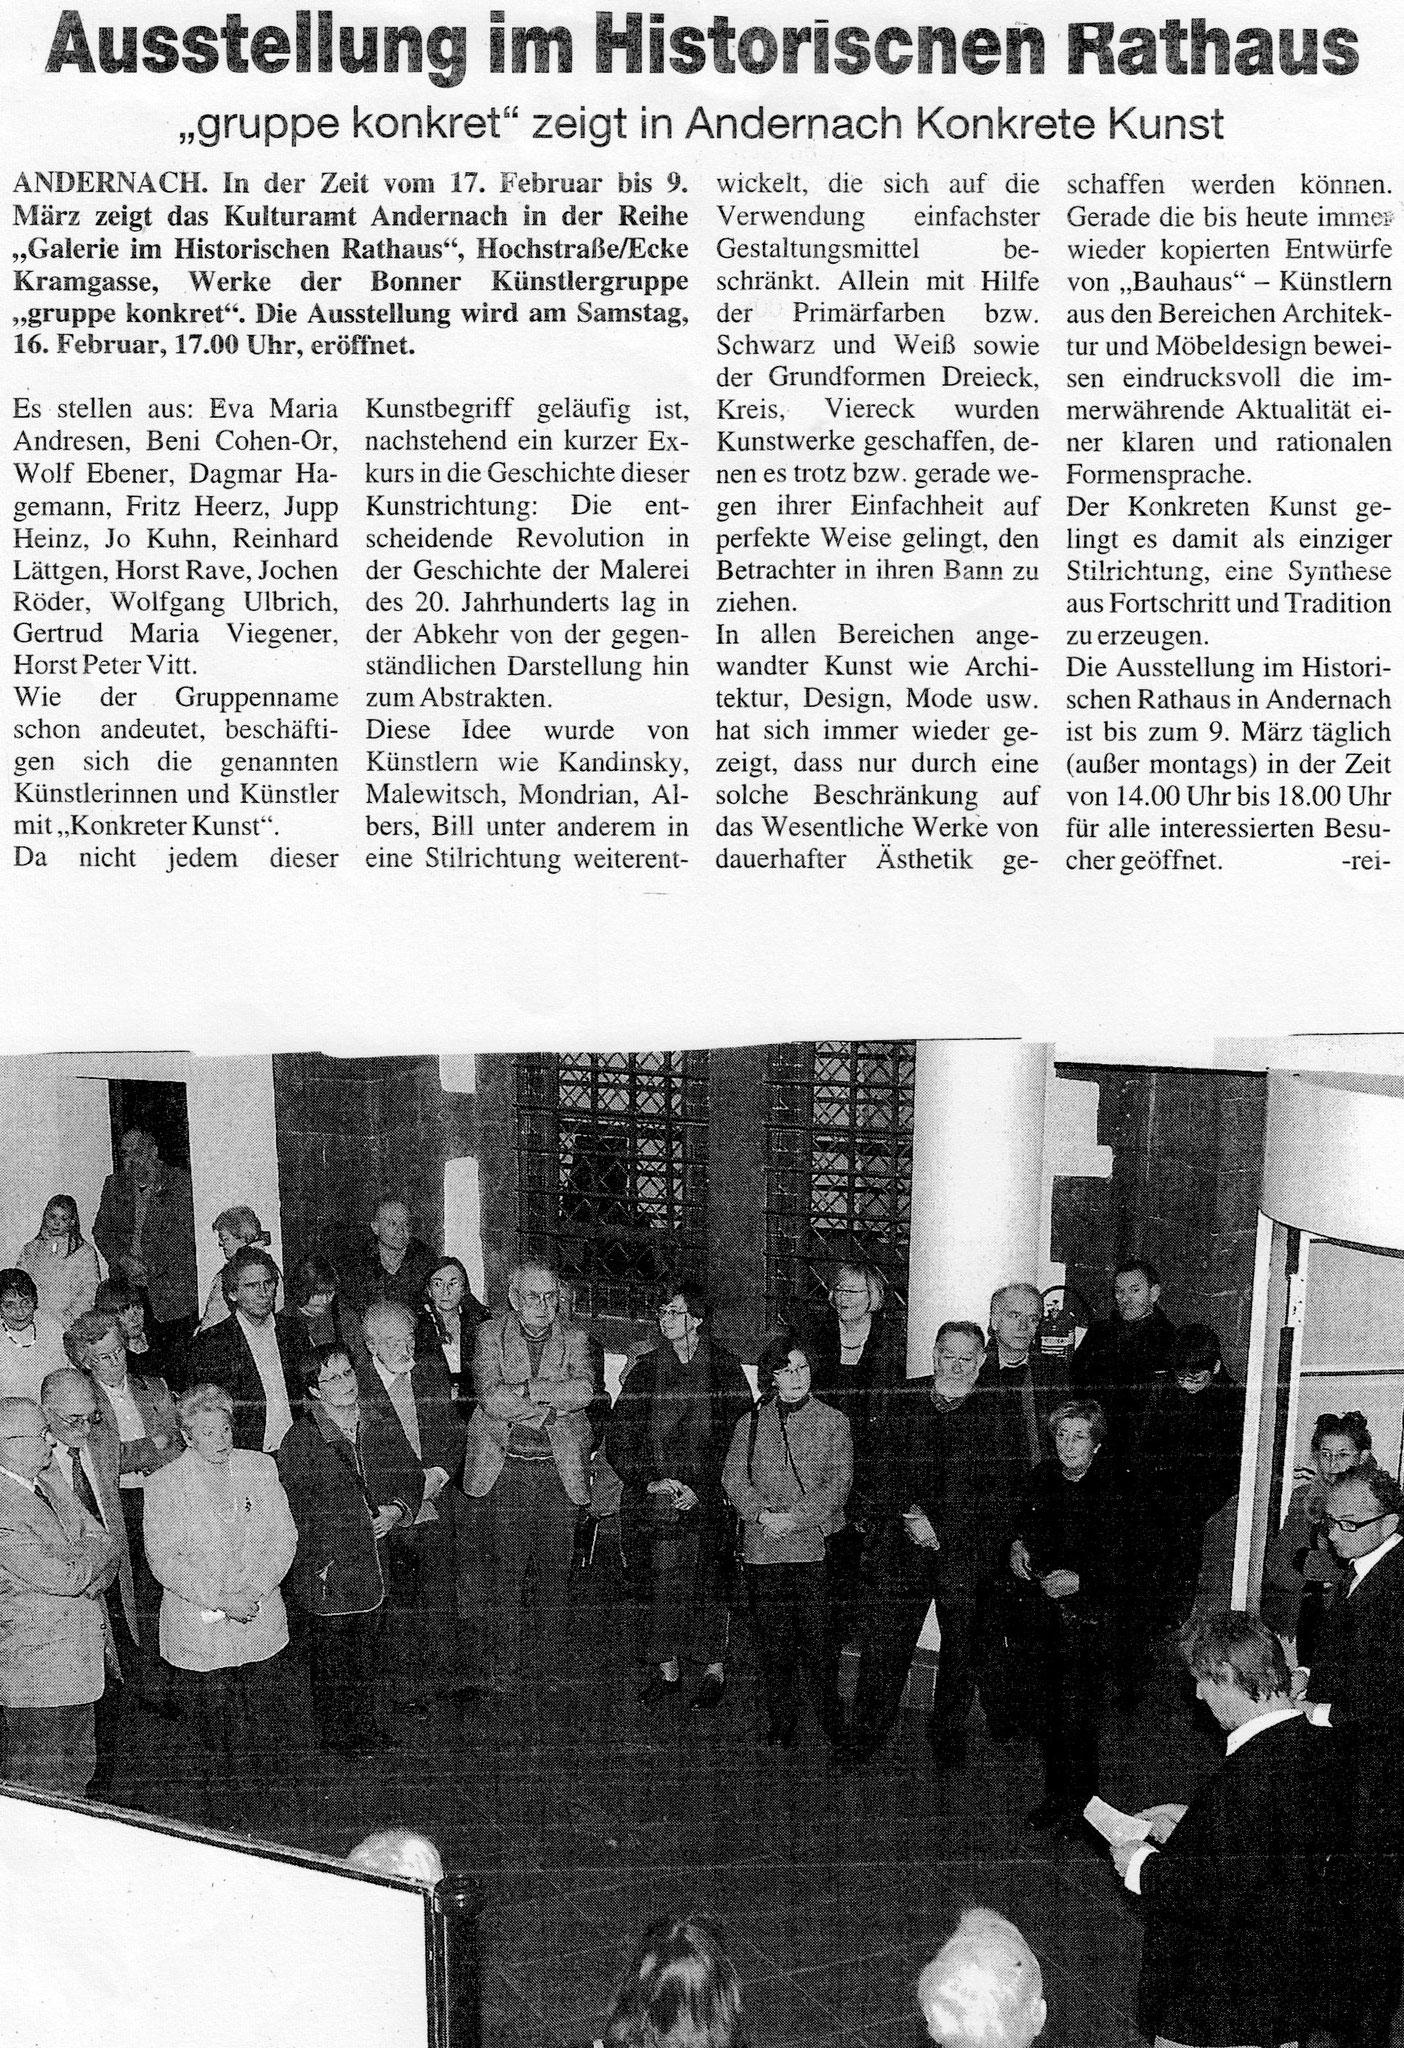 Andernach 2001